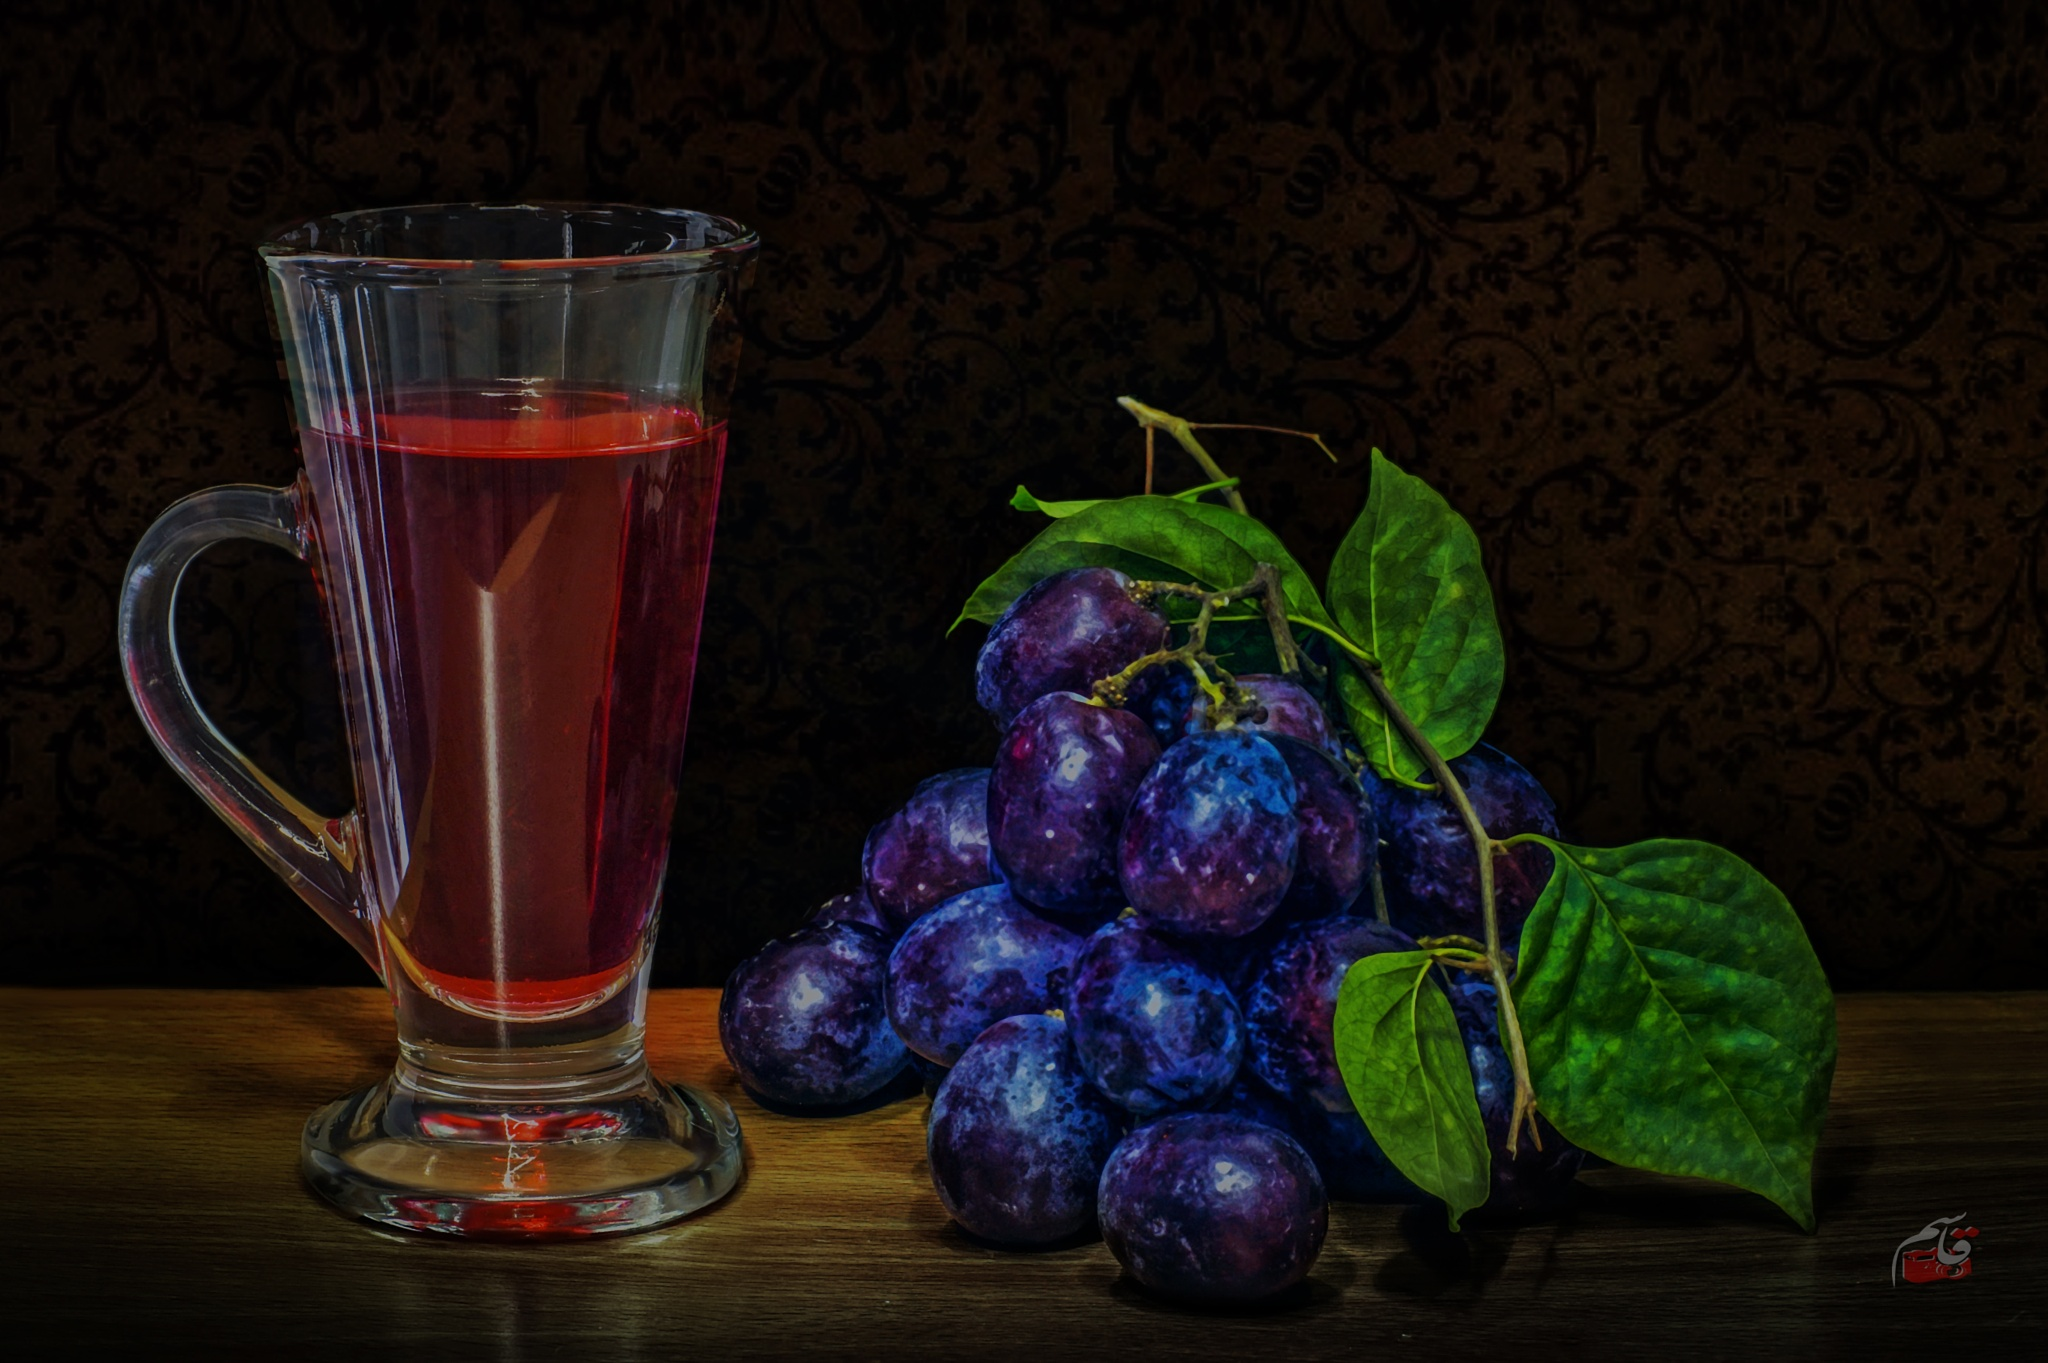 Grape juice by Qasem El Akhdar